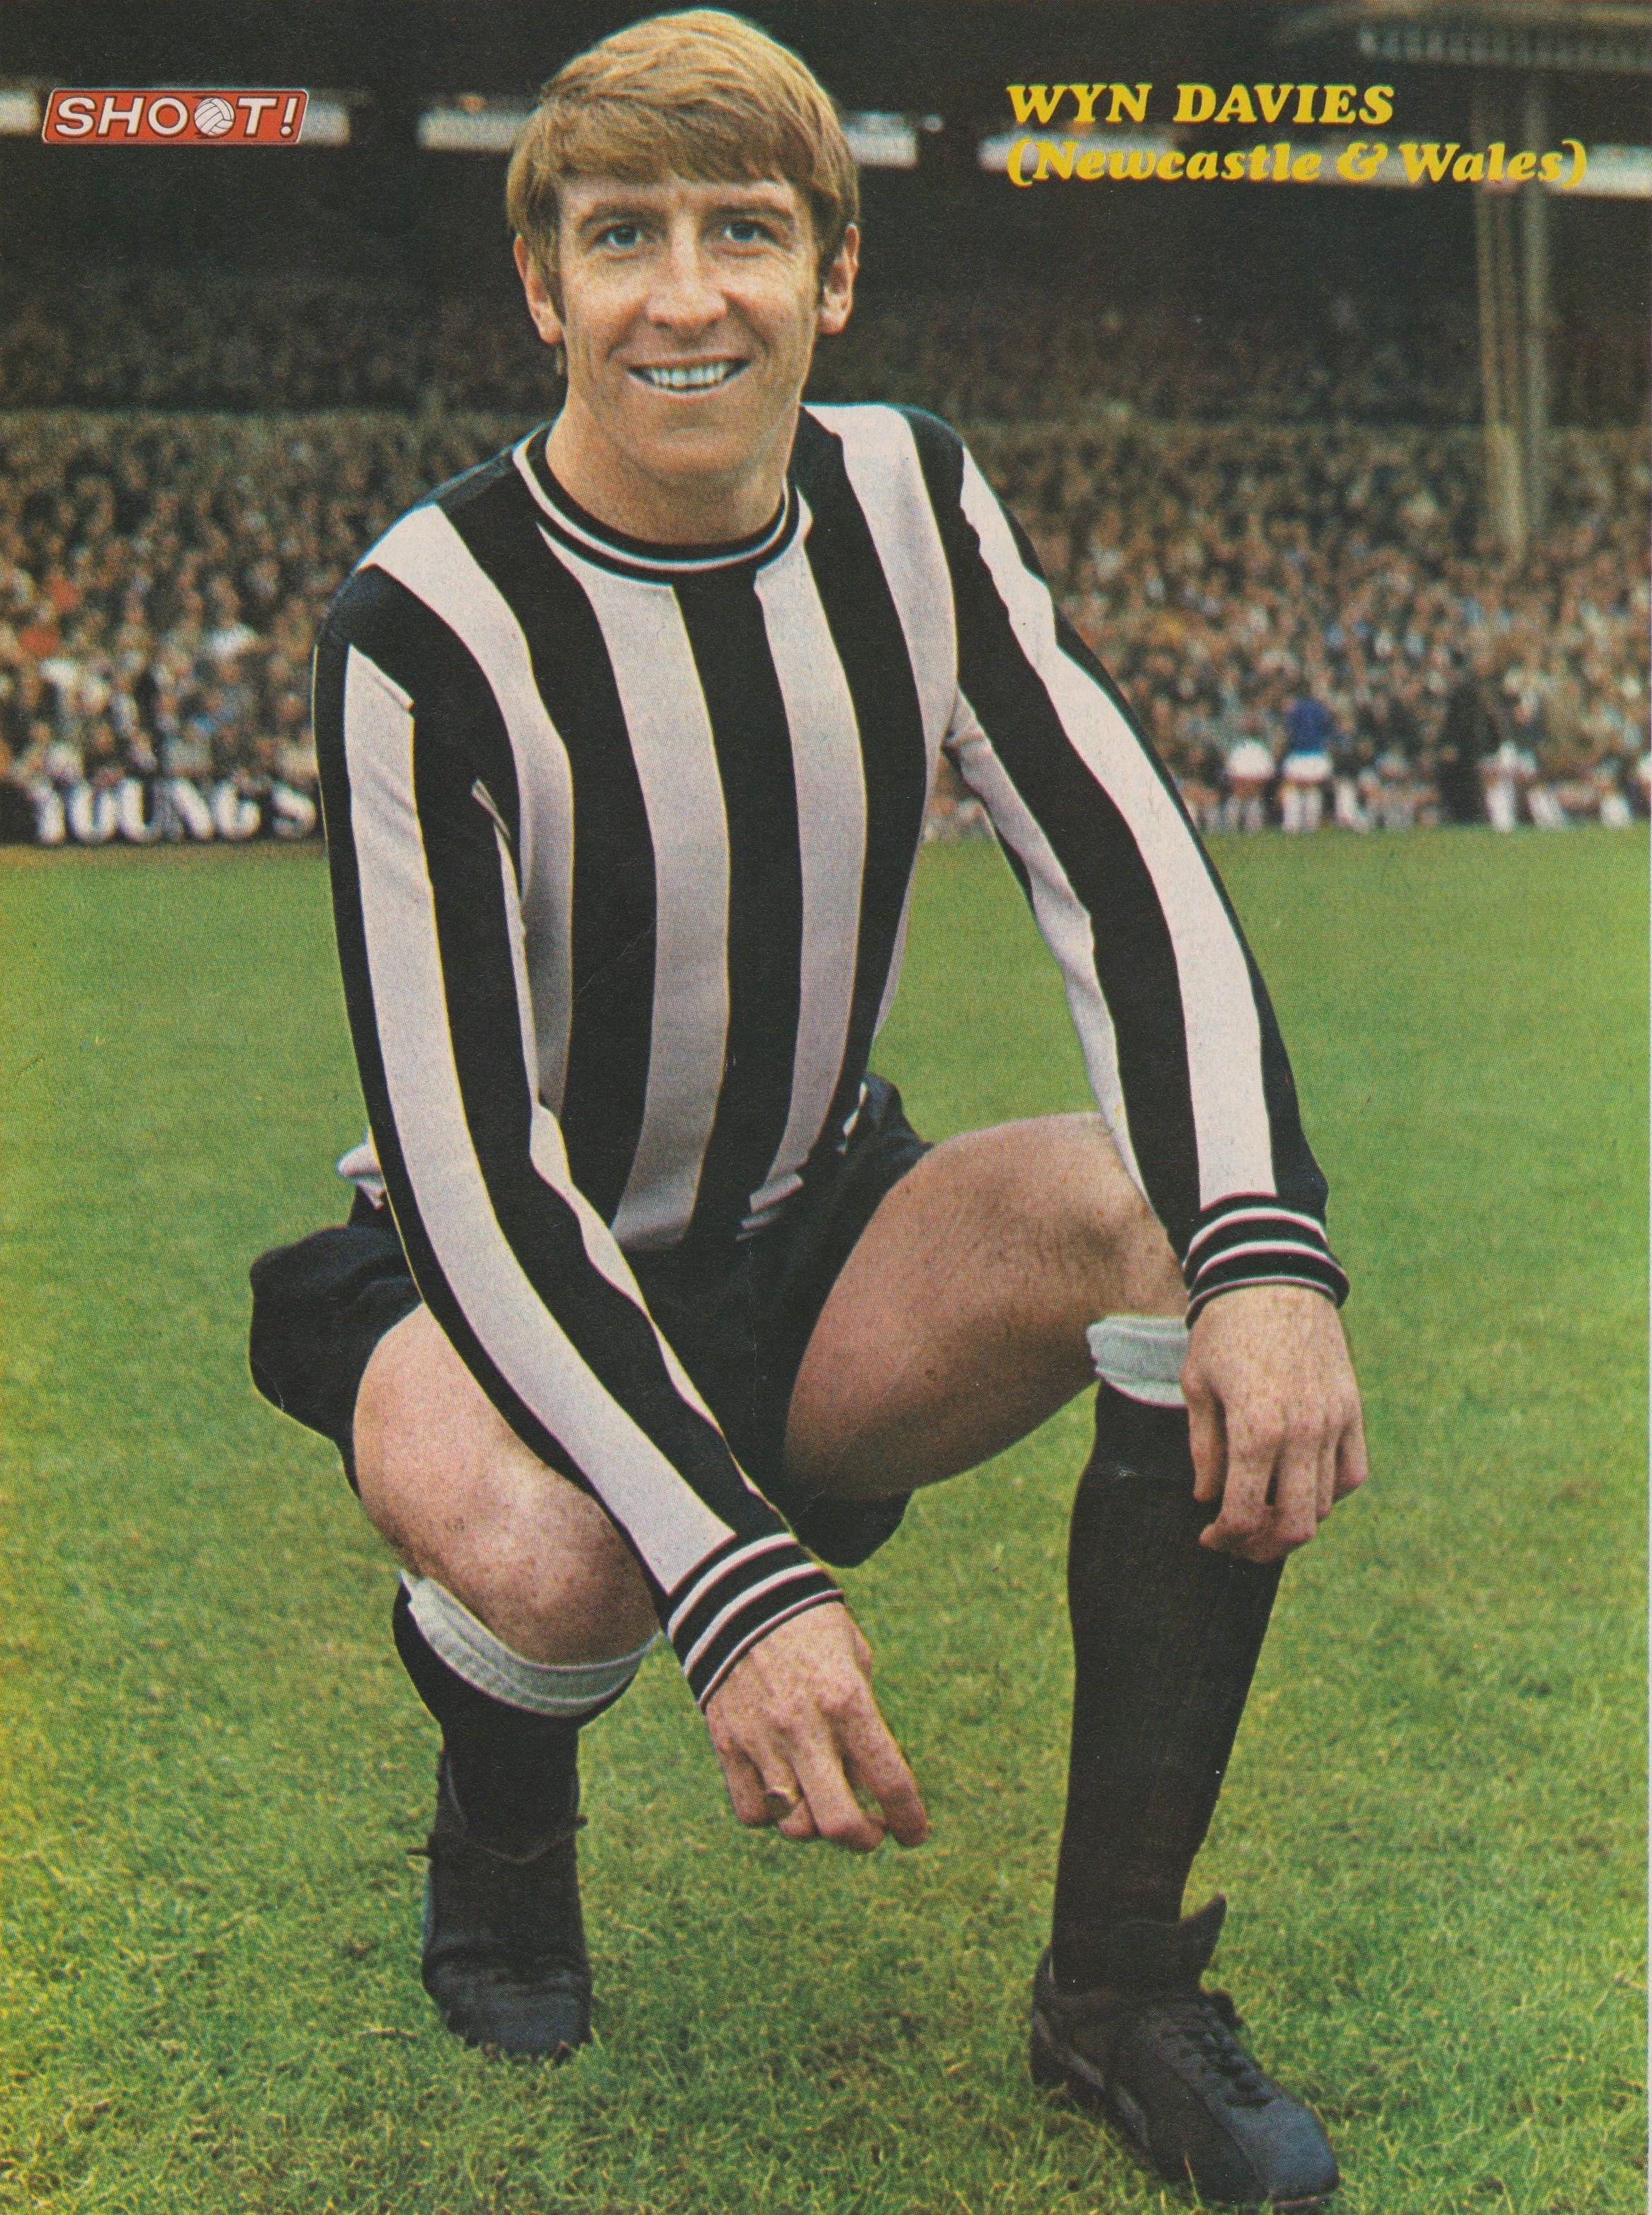 Wyn Davies Newcastle United 1969 Newcastle united, Newcastle